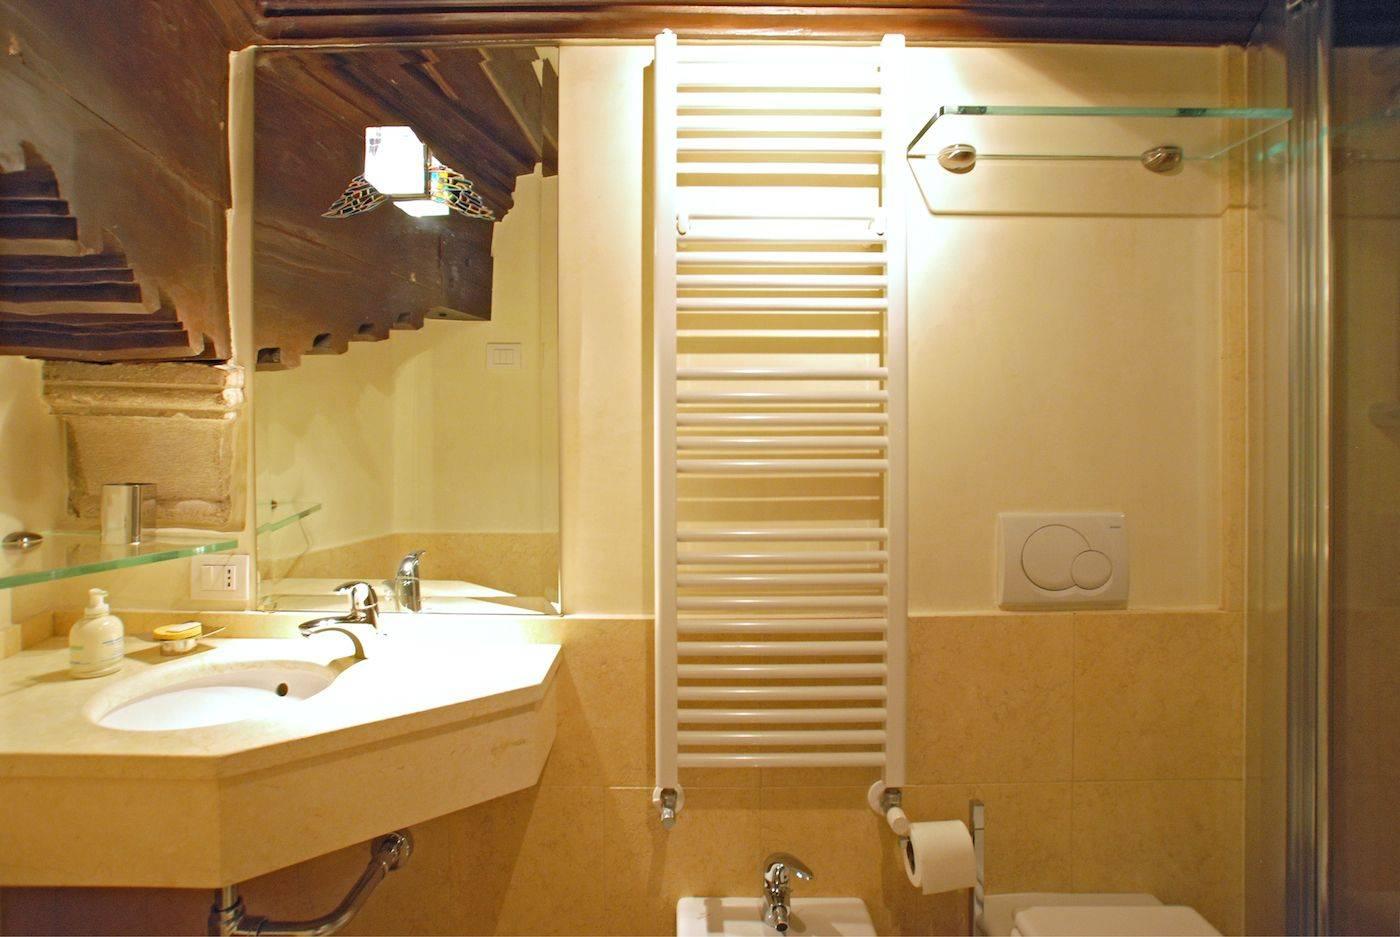 en-suite bathroom 1 with shower